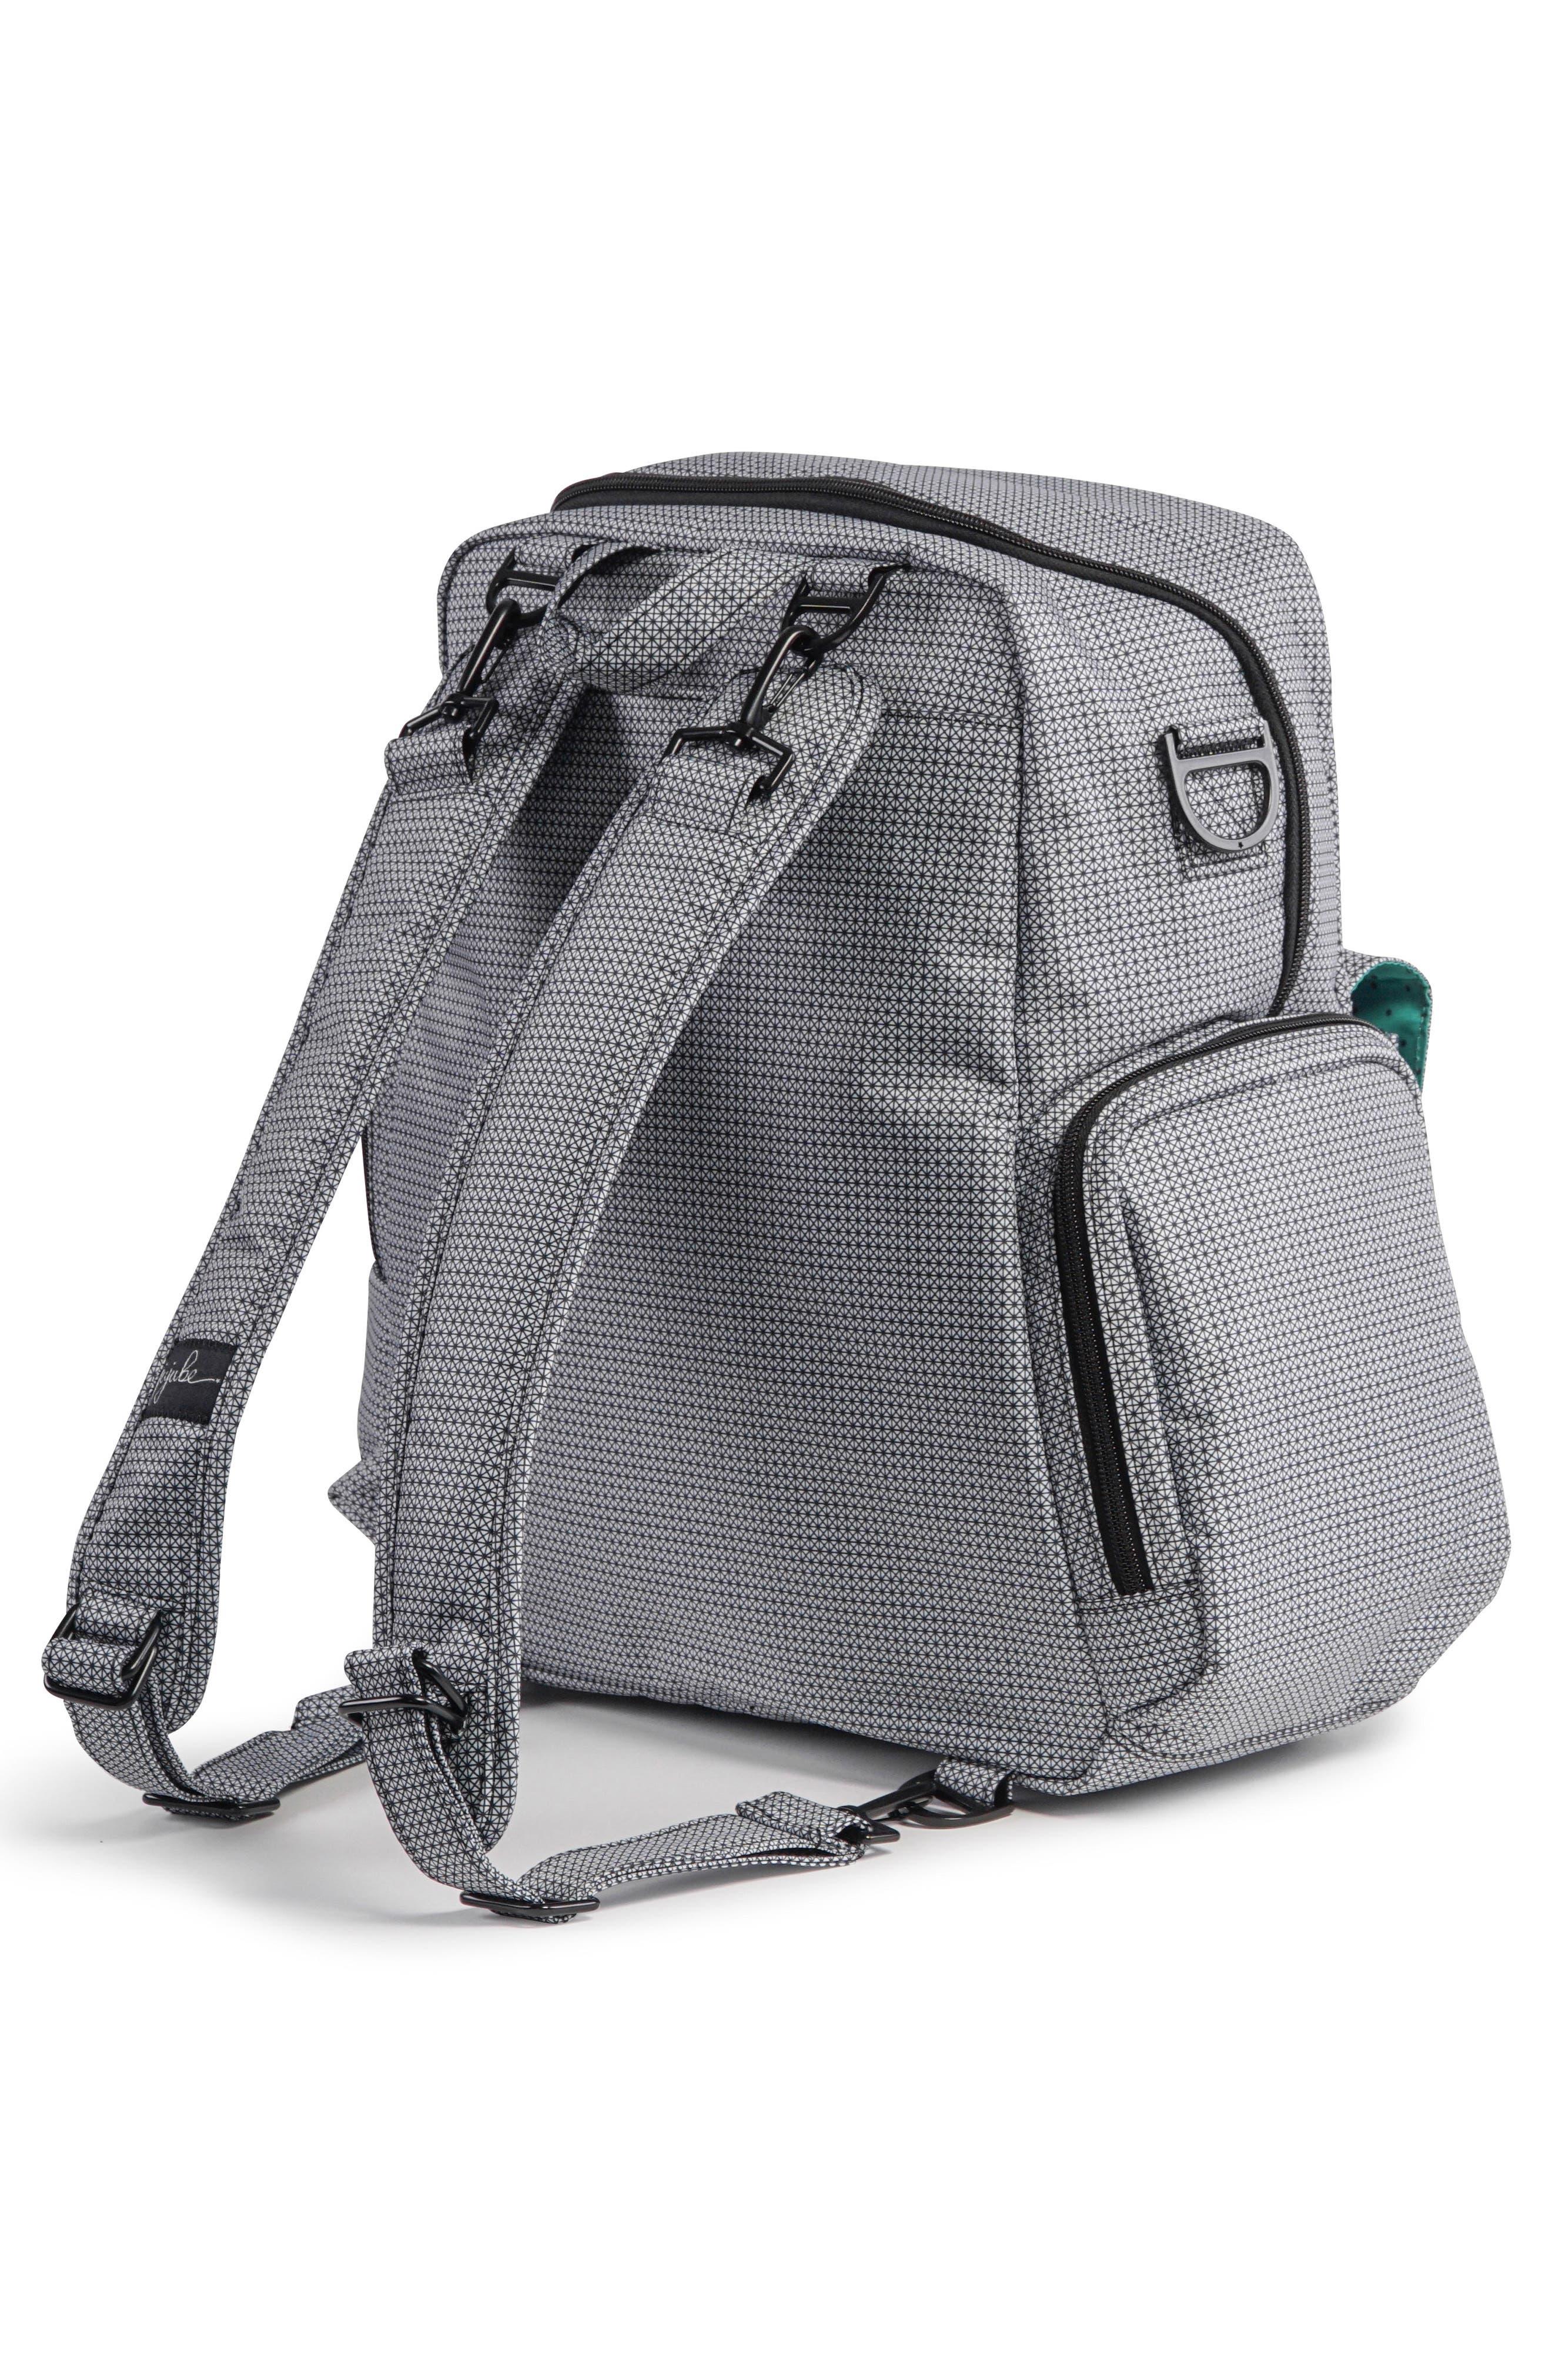 Be Nurtured Pumping Backpack,                             Alternate thumbnail 9, color,                             BLACK MATRIX